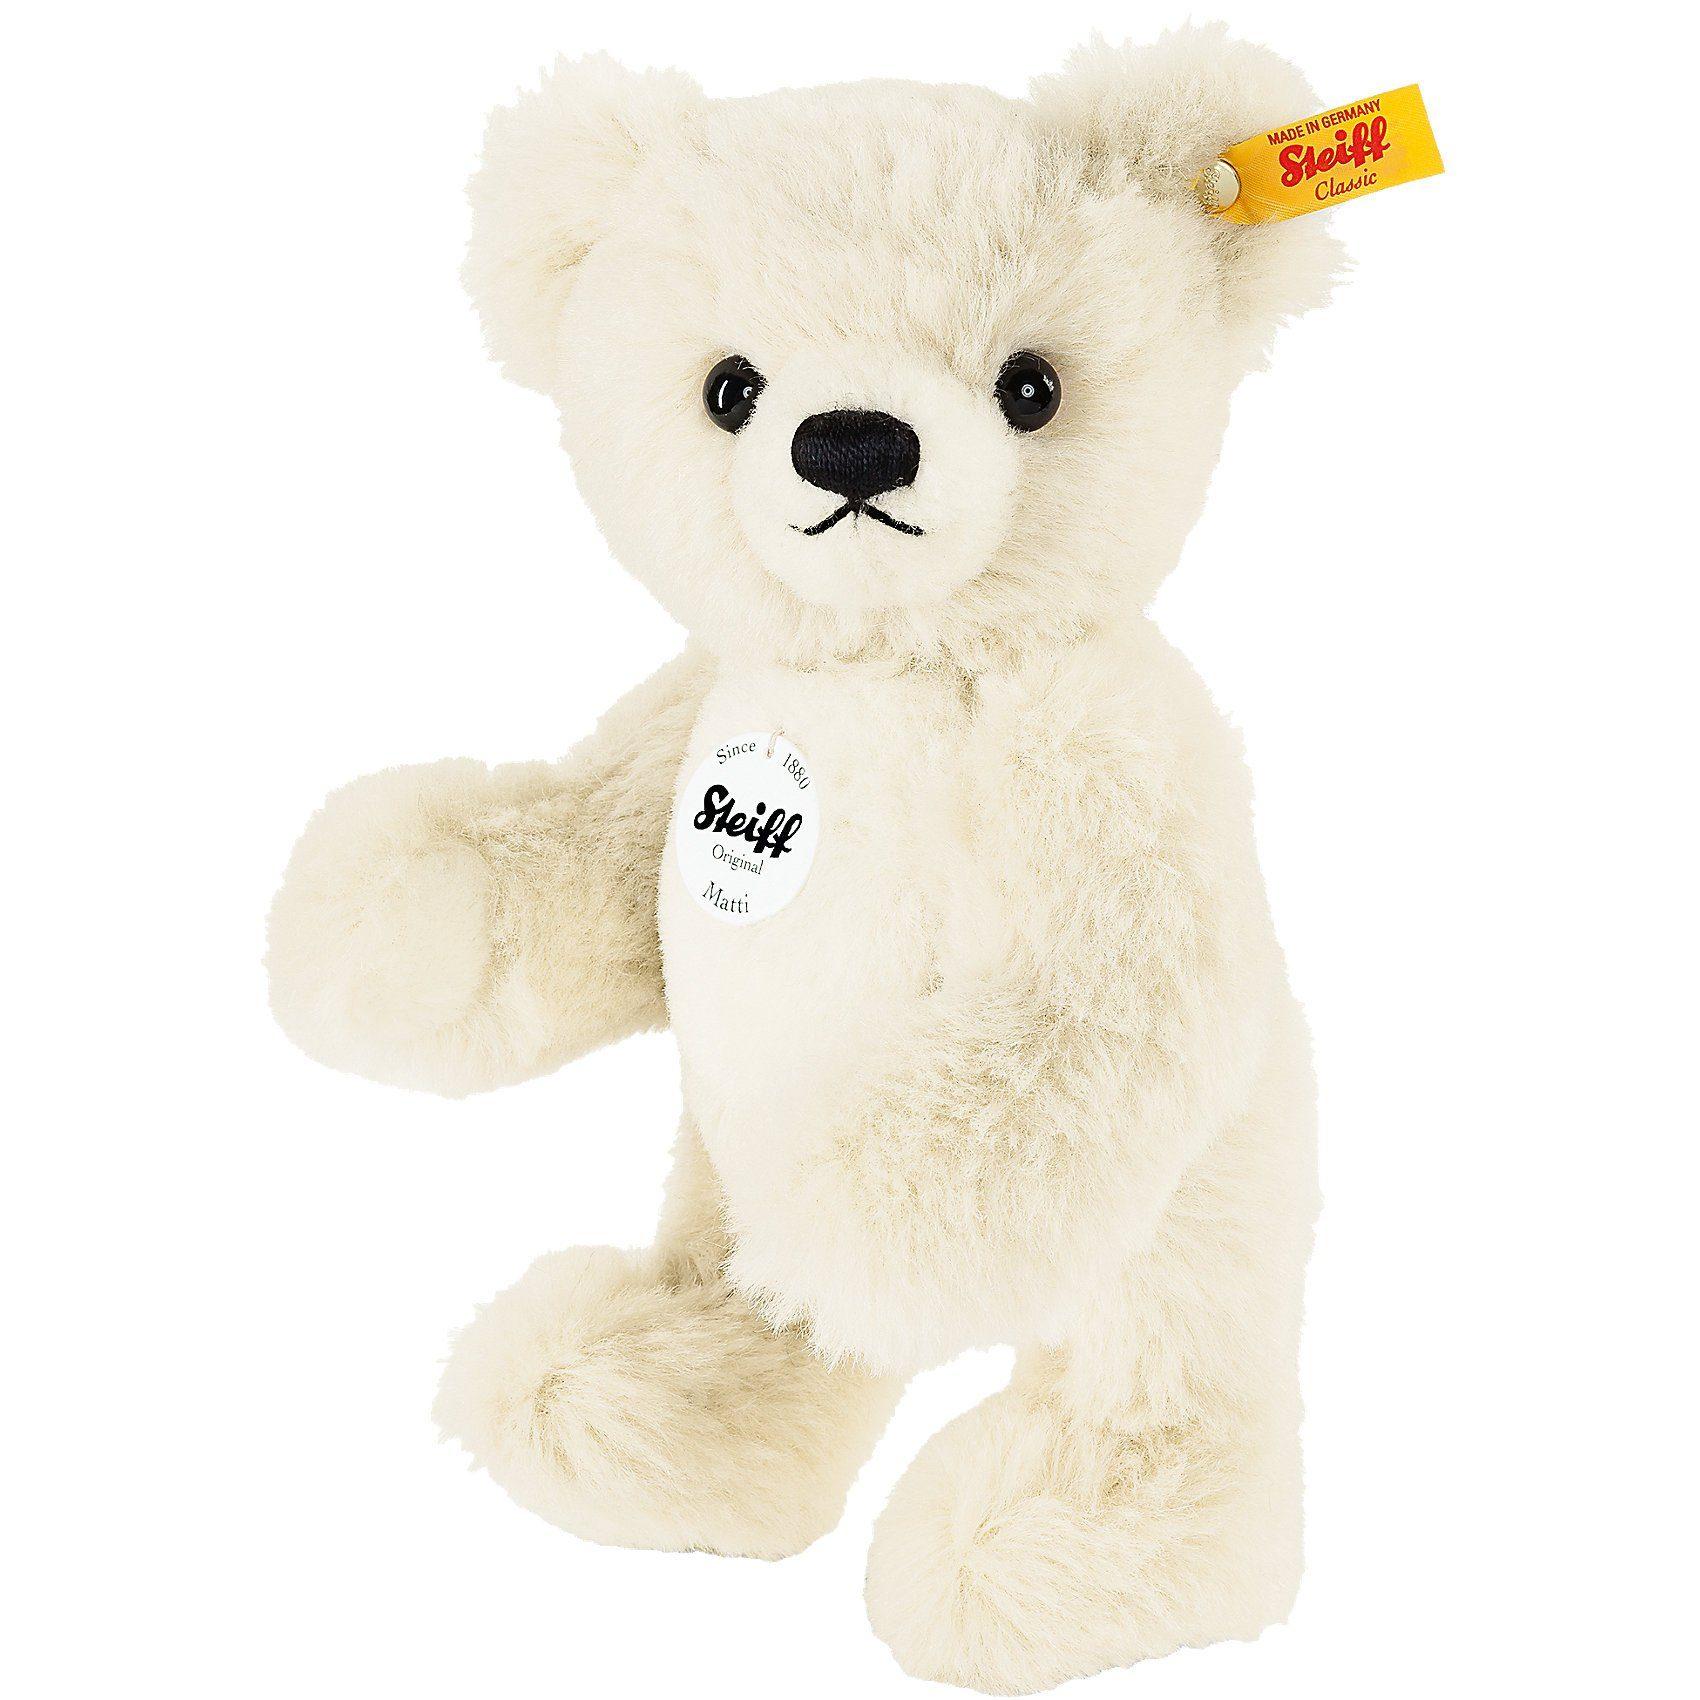 Steiff Teddybär Matti, 25 cm creme